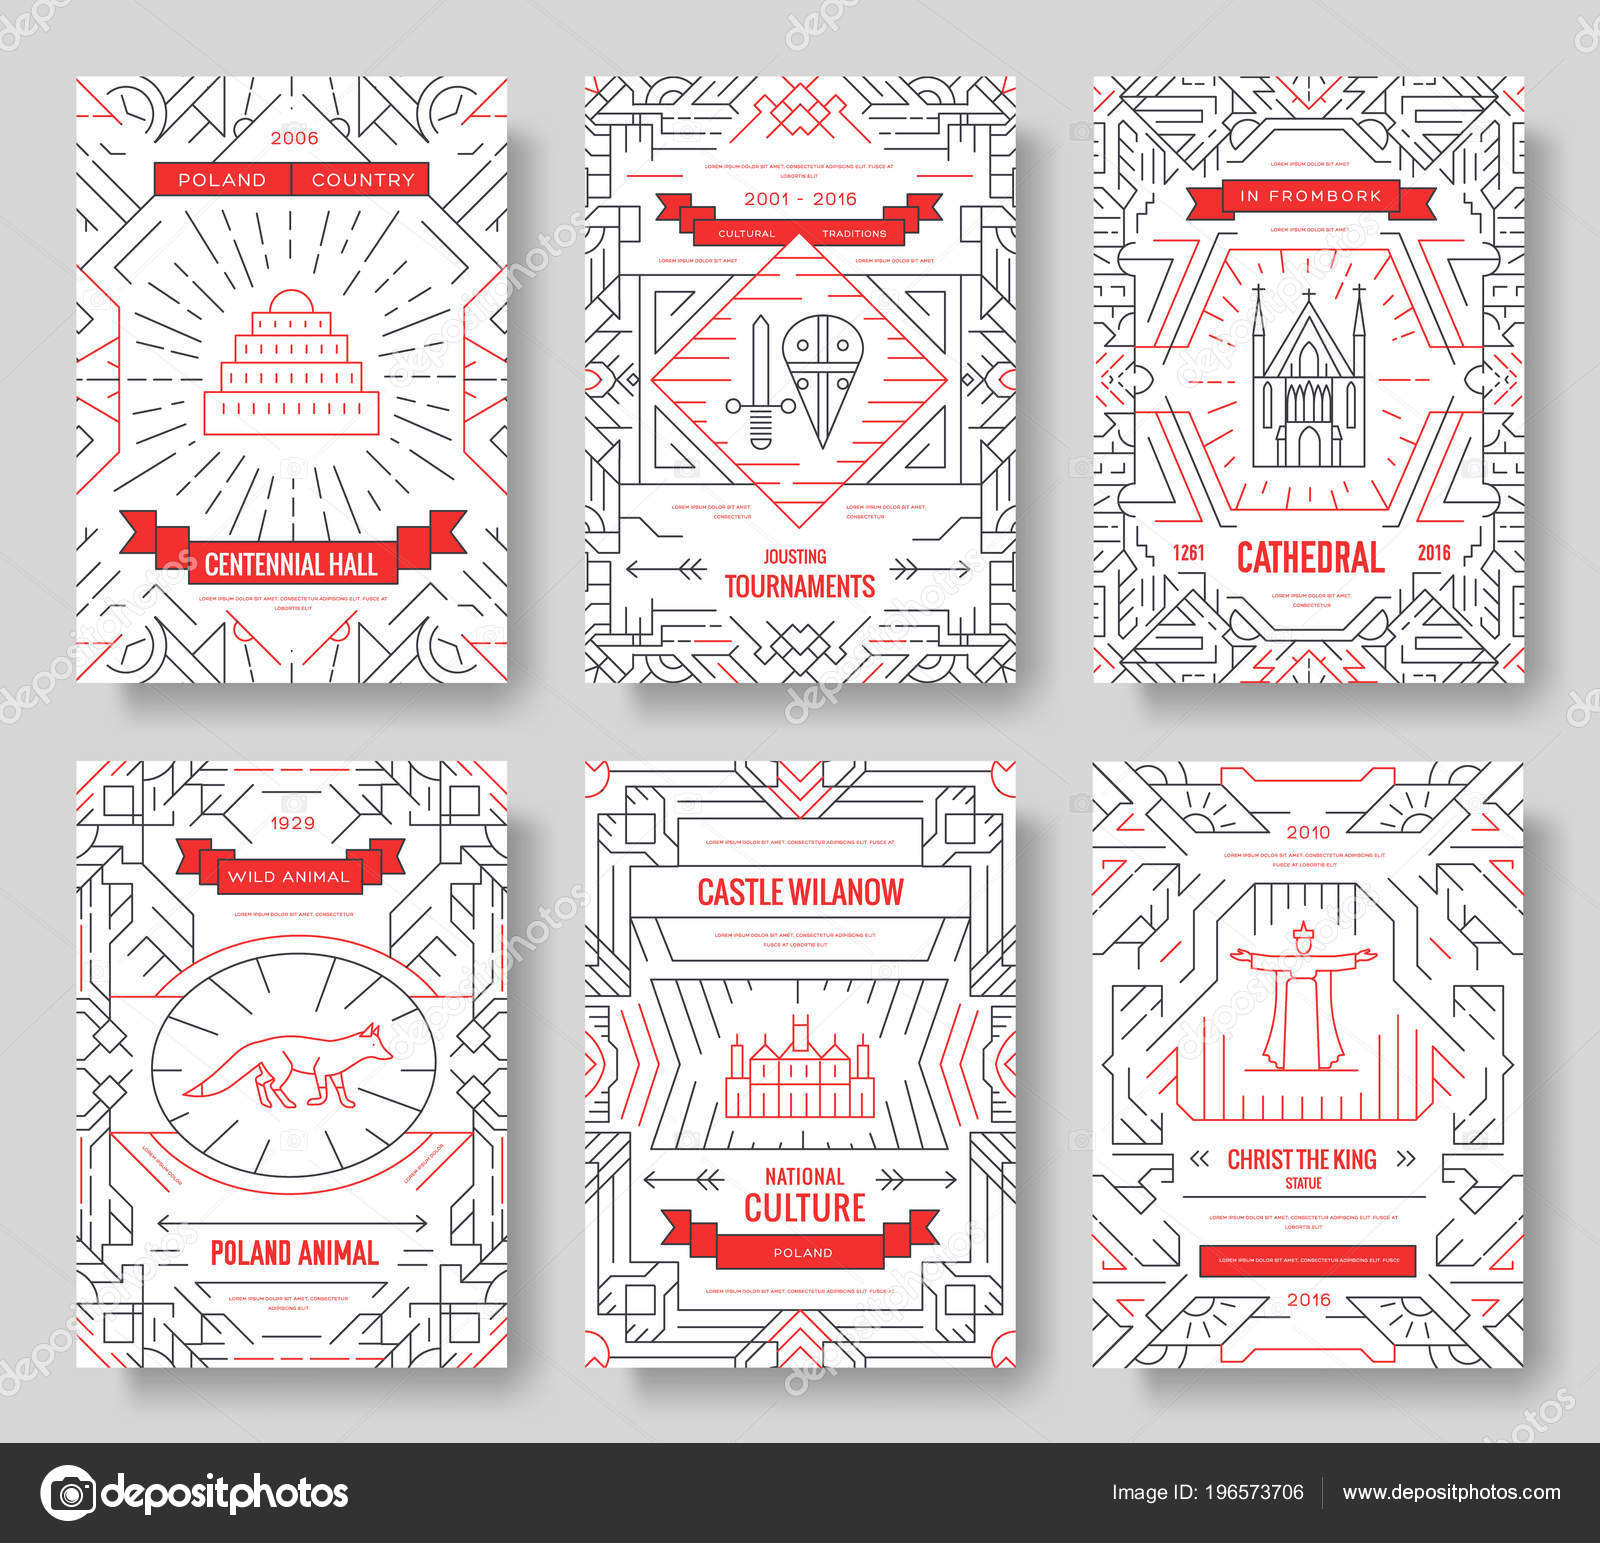 Architektur Plakat Layout